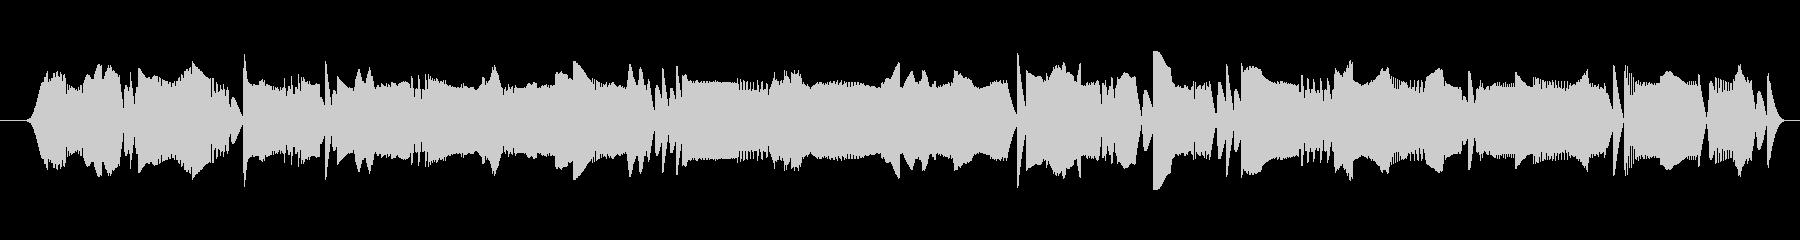 FX スペースコントロール01の未再生の波形